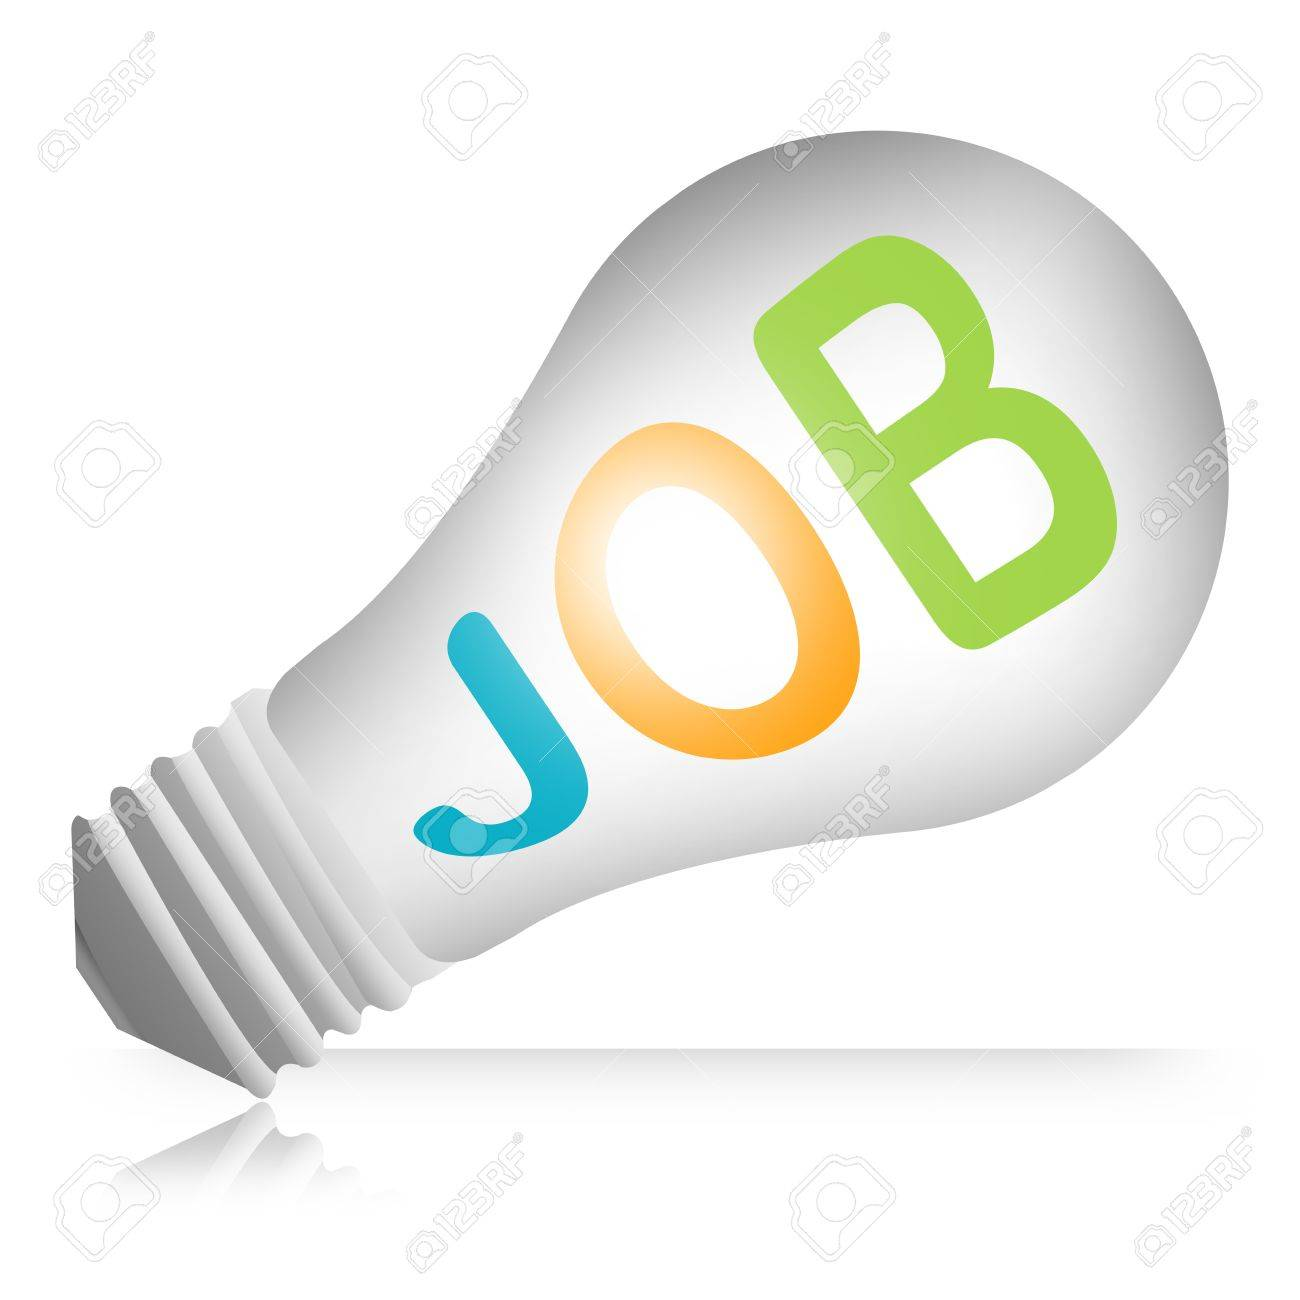 d light bulb job for job seeker campaign isolated on white 3d light bulb job for job seeker campaign isolated on white background stock photo 17455064